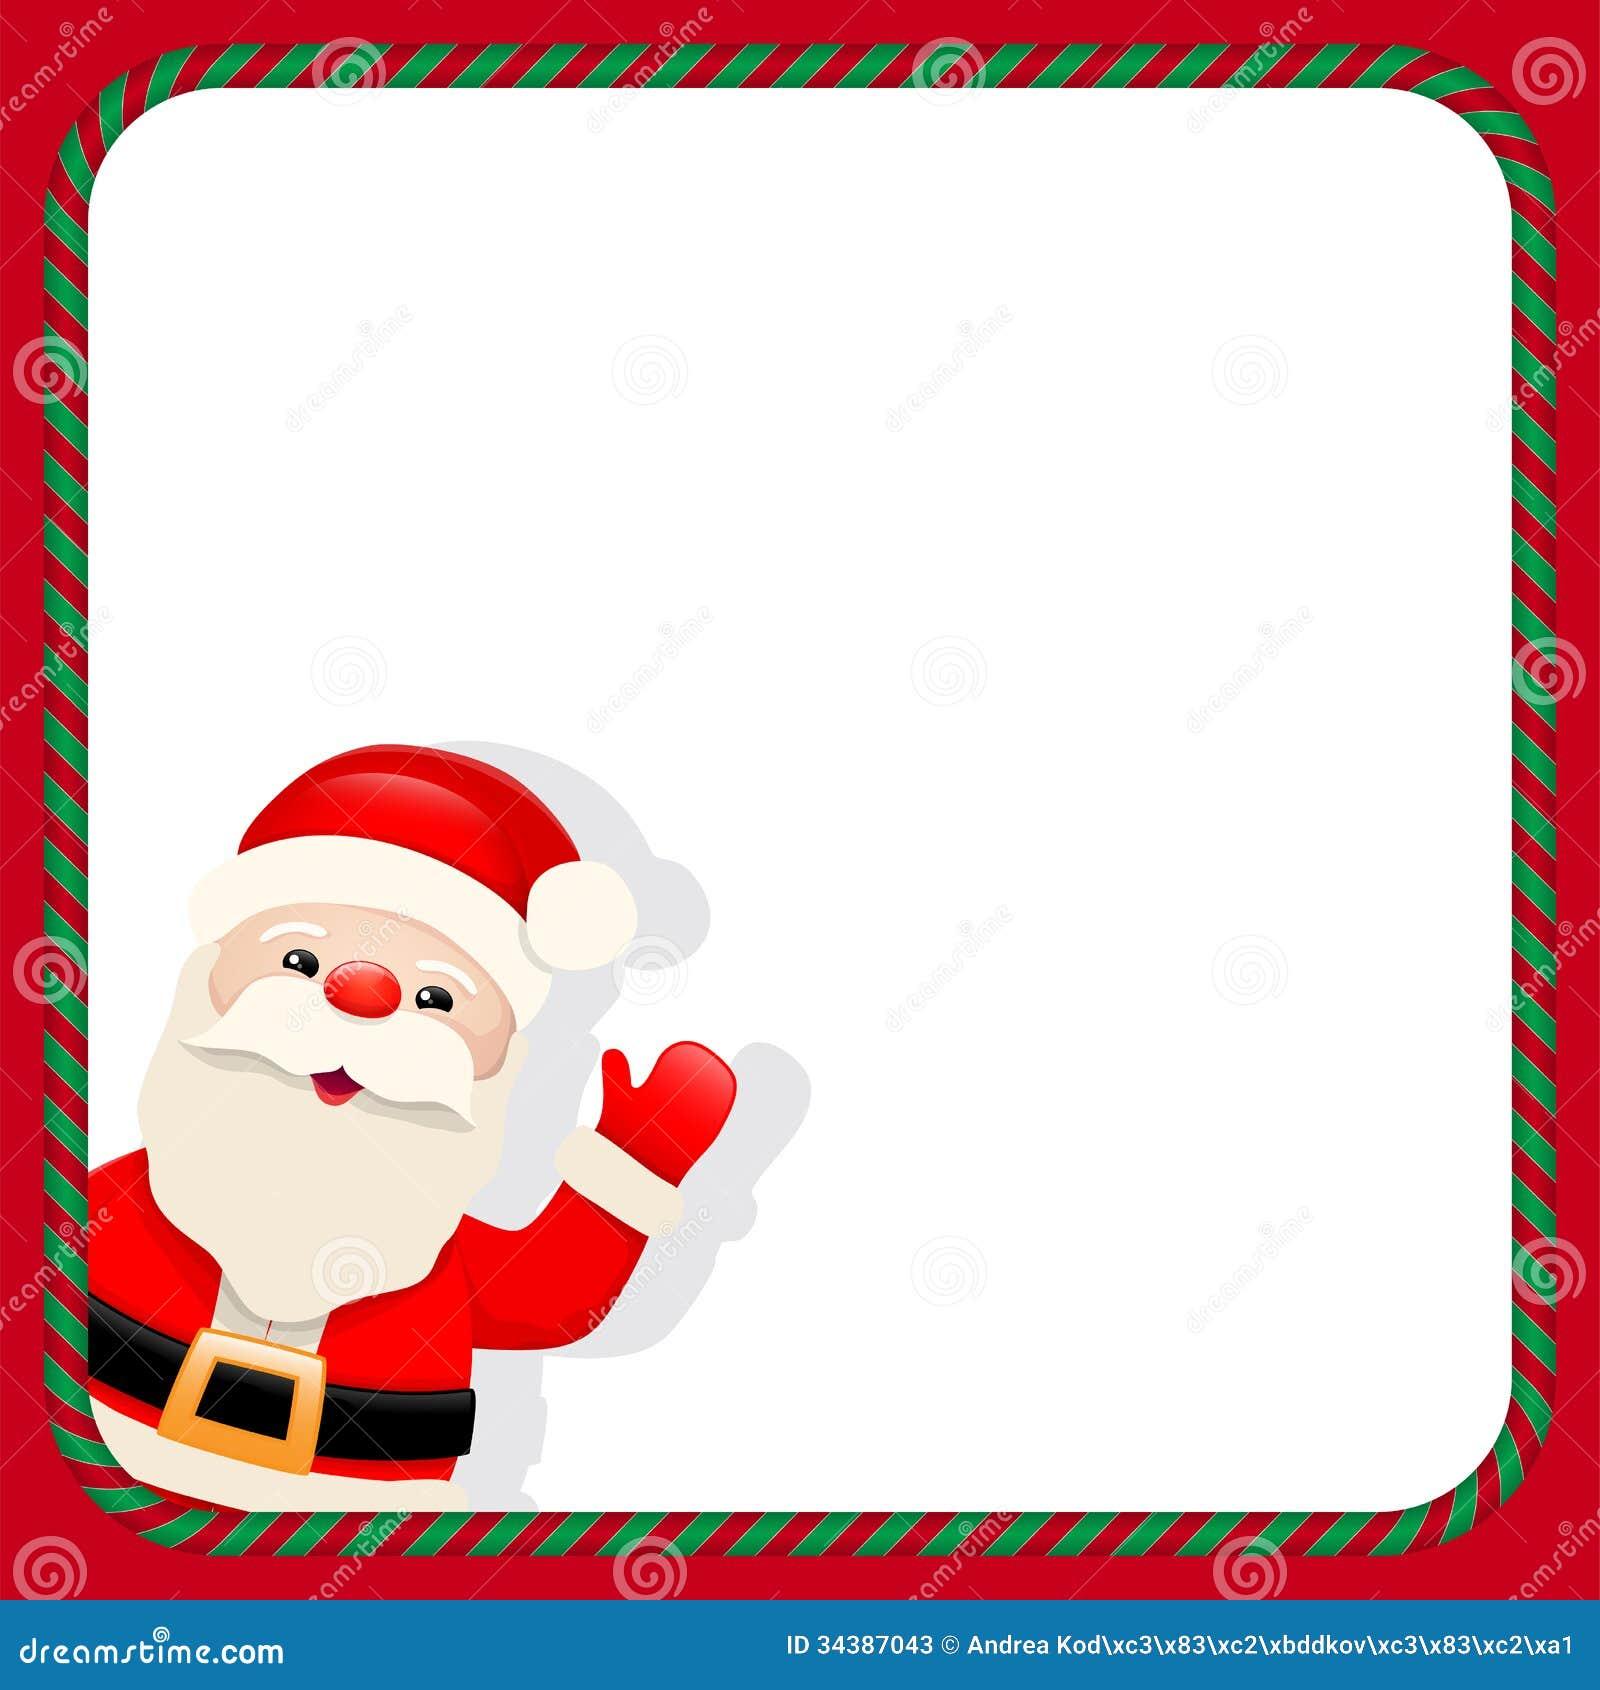 Santa Claus in christmas frame, cartoon character, illustration.